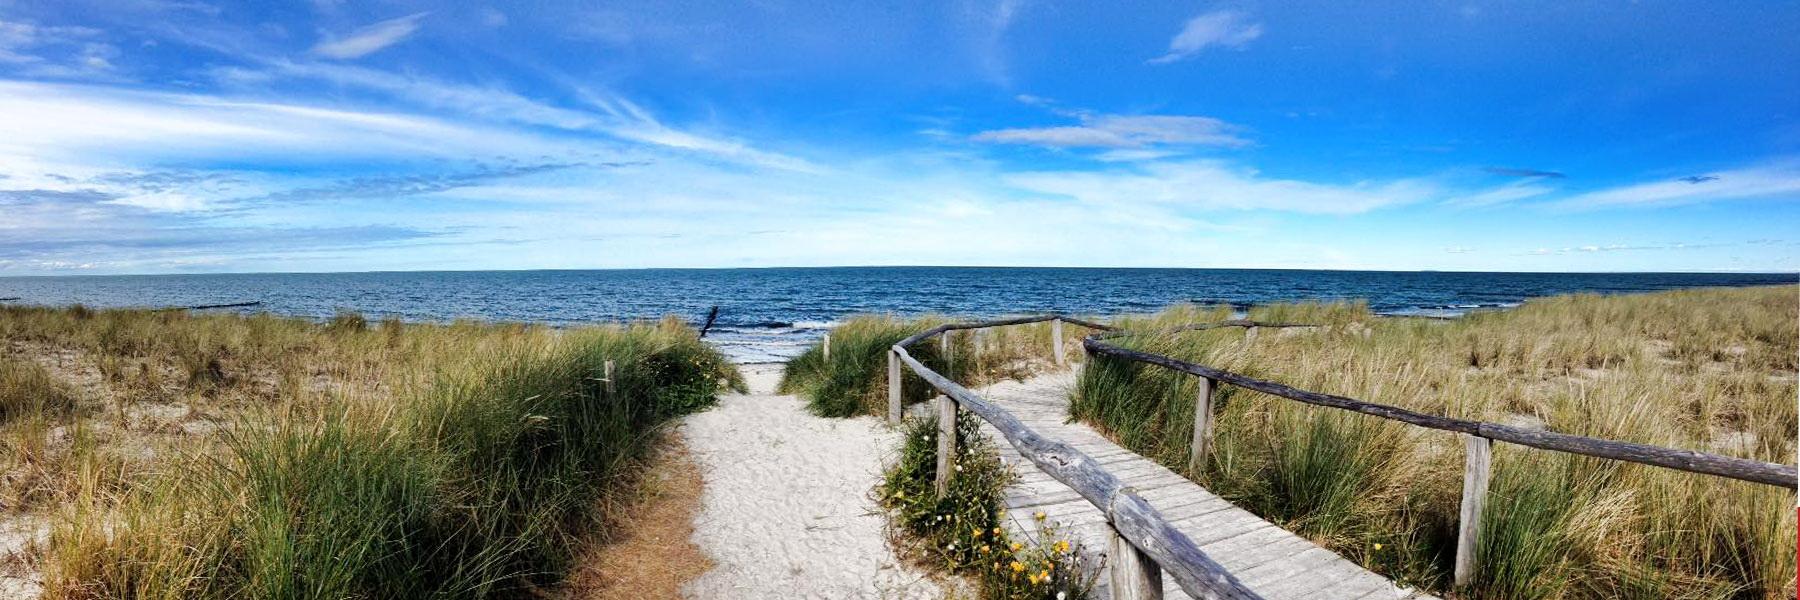 Strandzugang - Ostseeheilbad Zingst